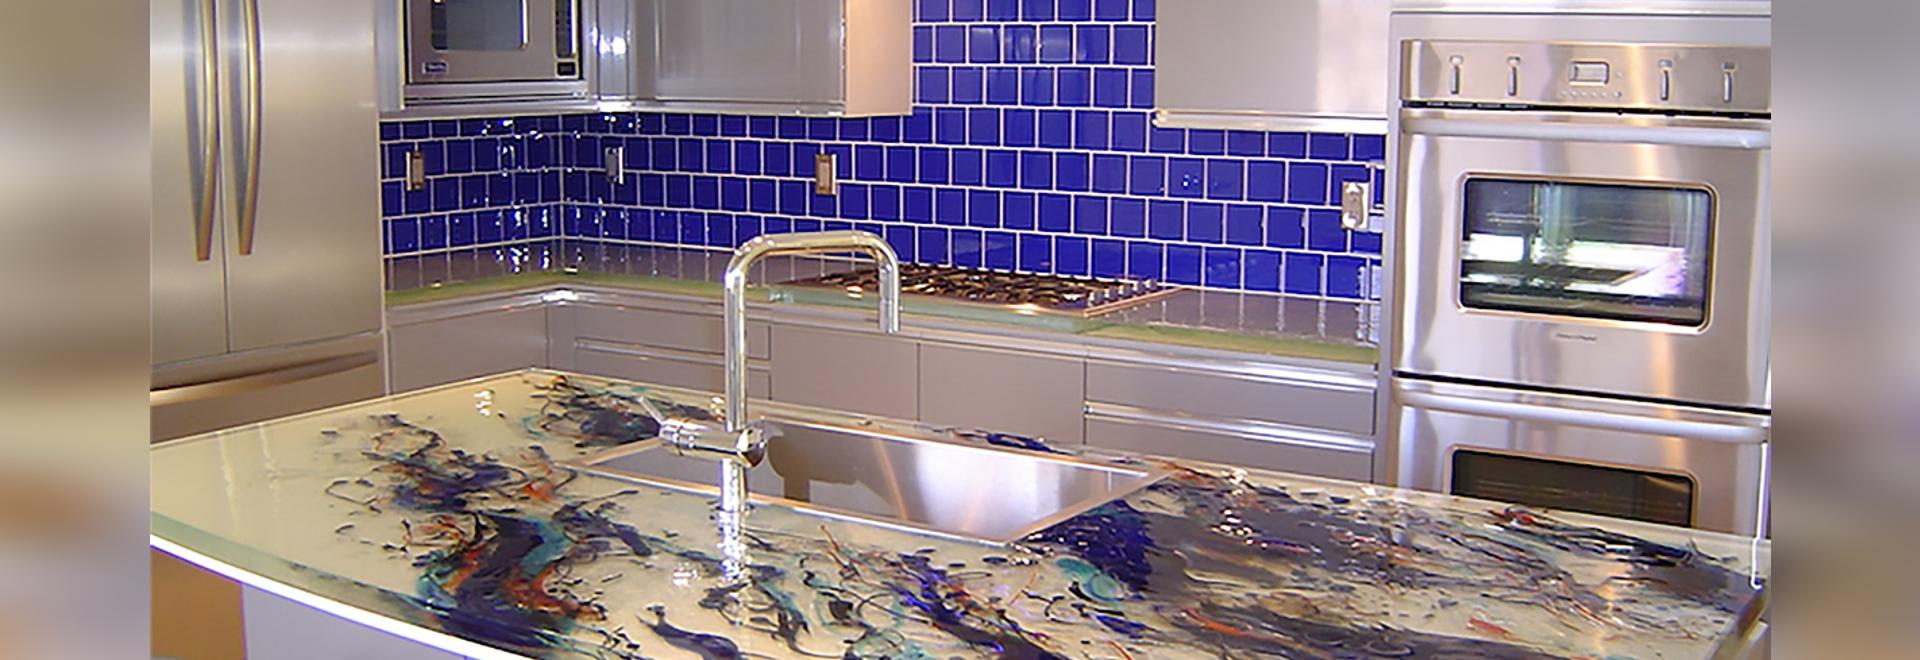 Artistic Kitchen Island